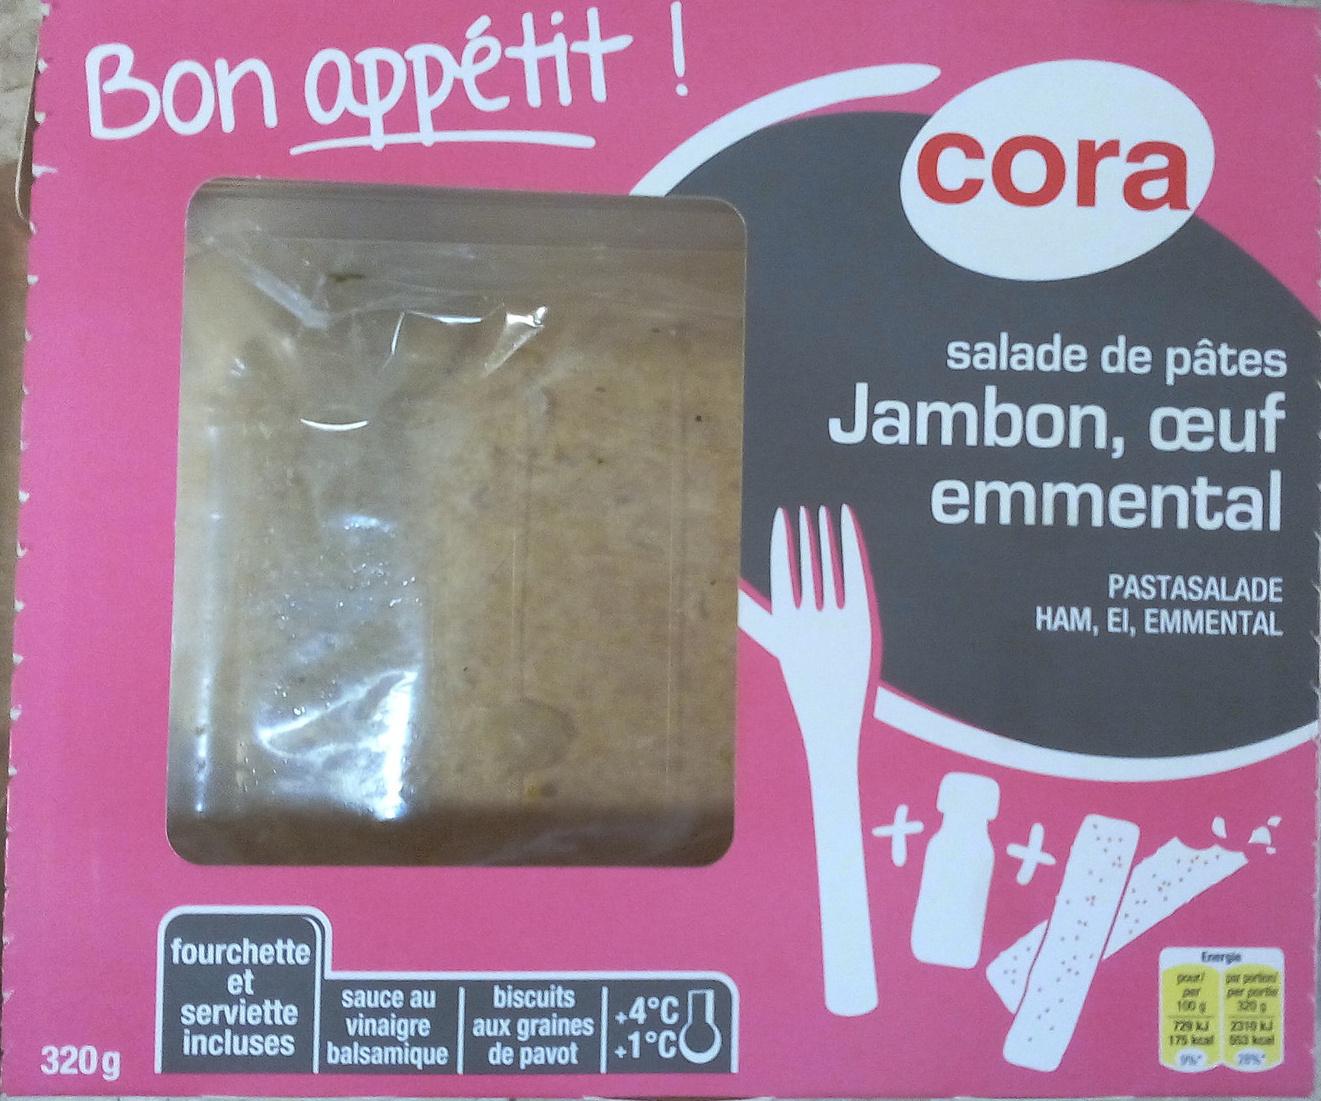 Salade de pâtes, Jambon, œuf, emmental - Product